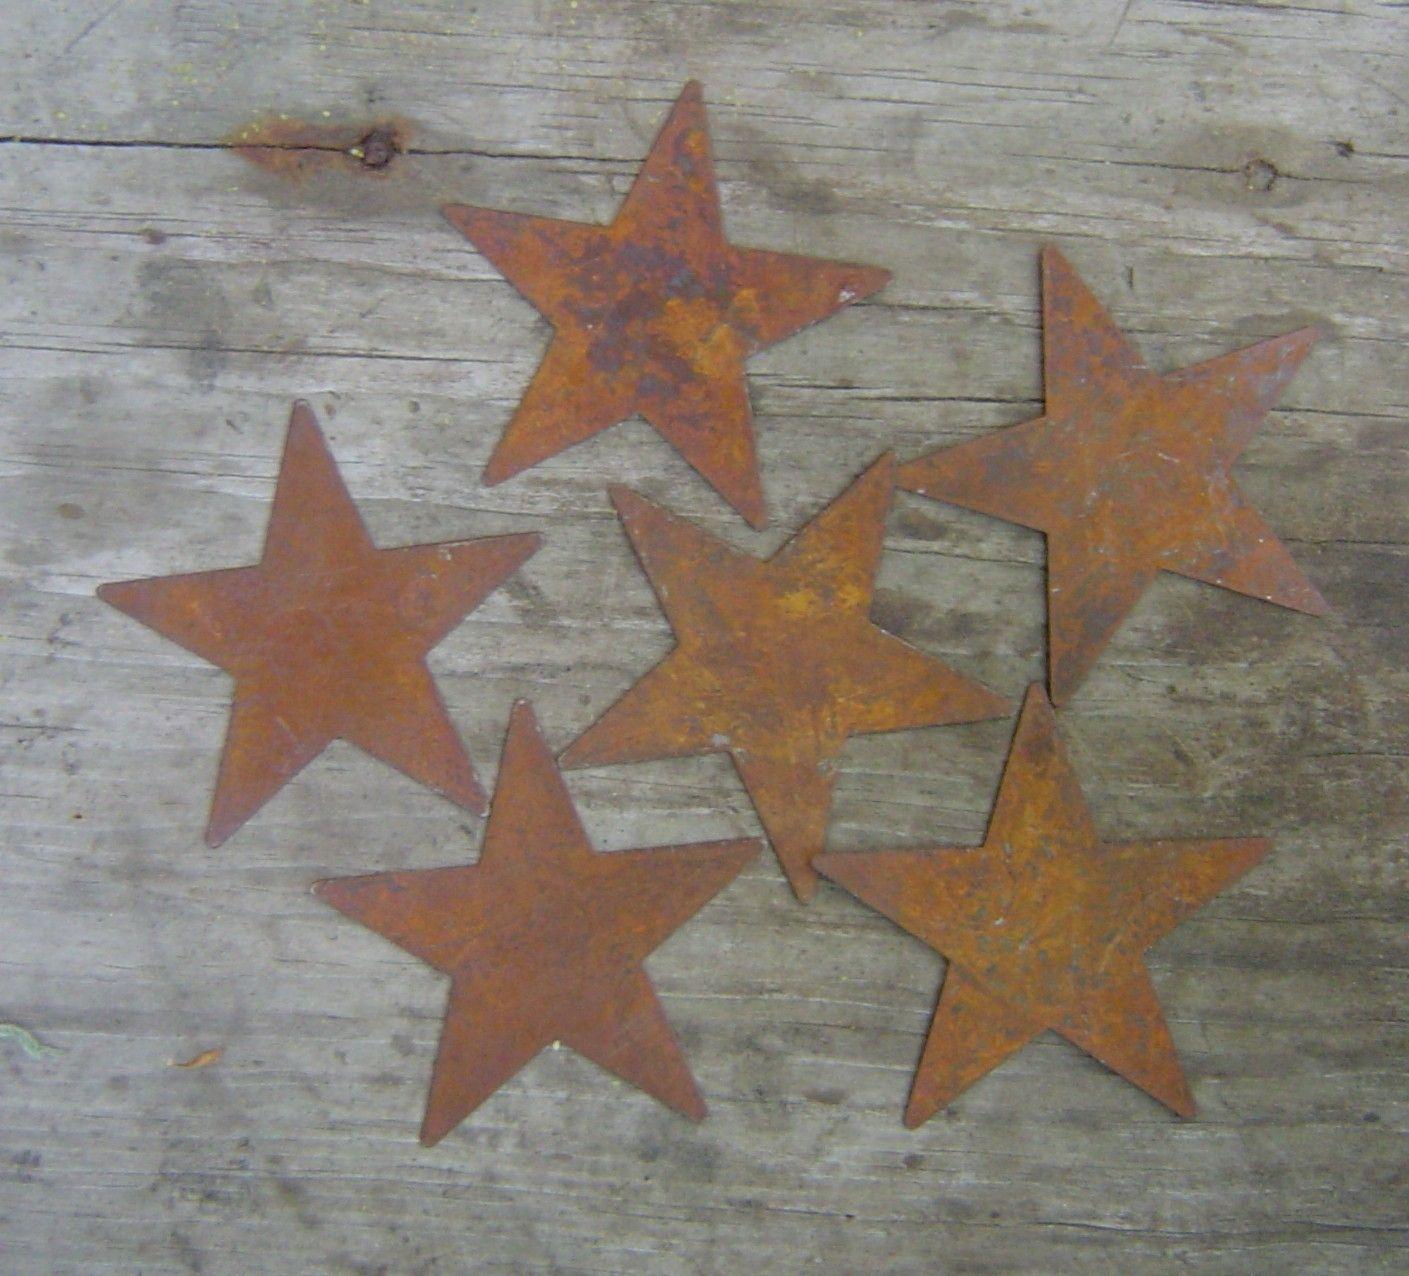 Rusty tin craft supplies - Twelve 12 Rusty Tin Stars Craft Supplies 1 25 Inch Scrapbooking Embellishments